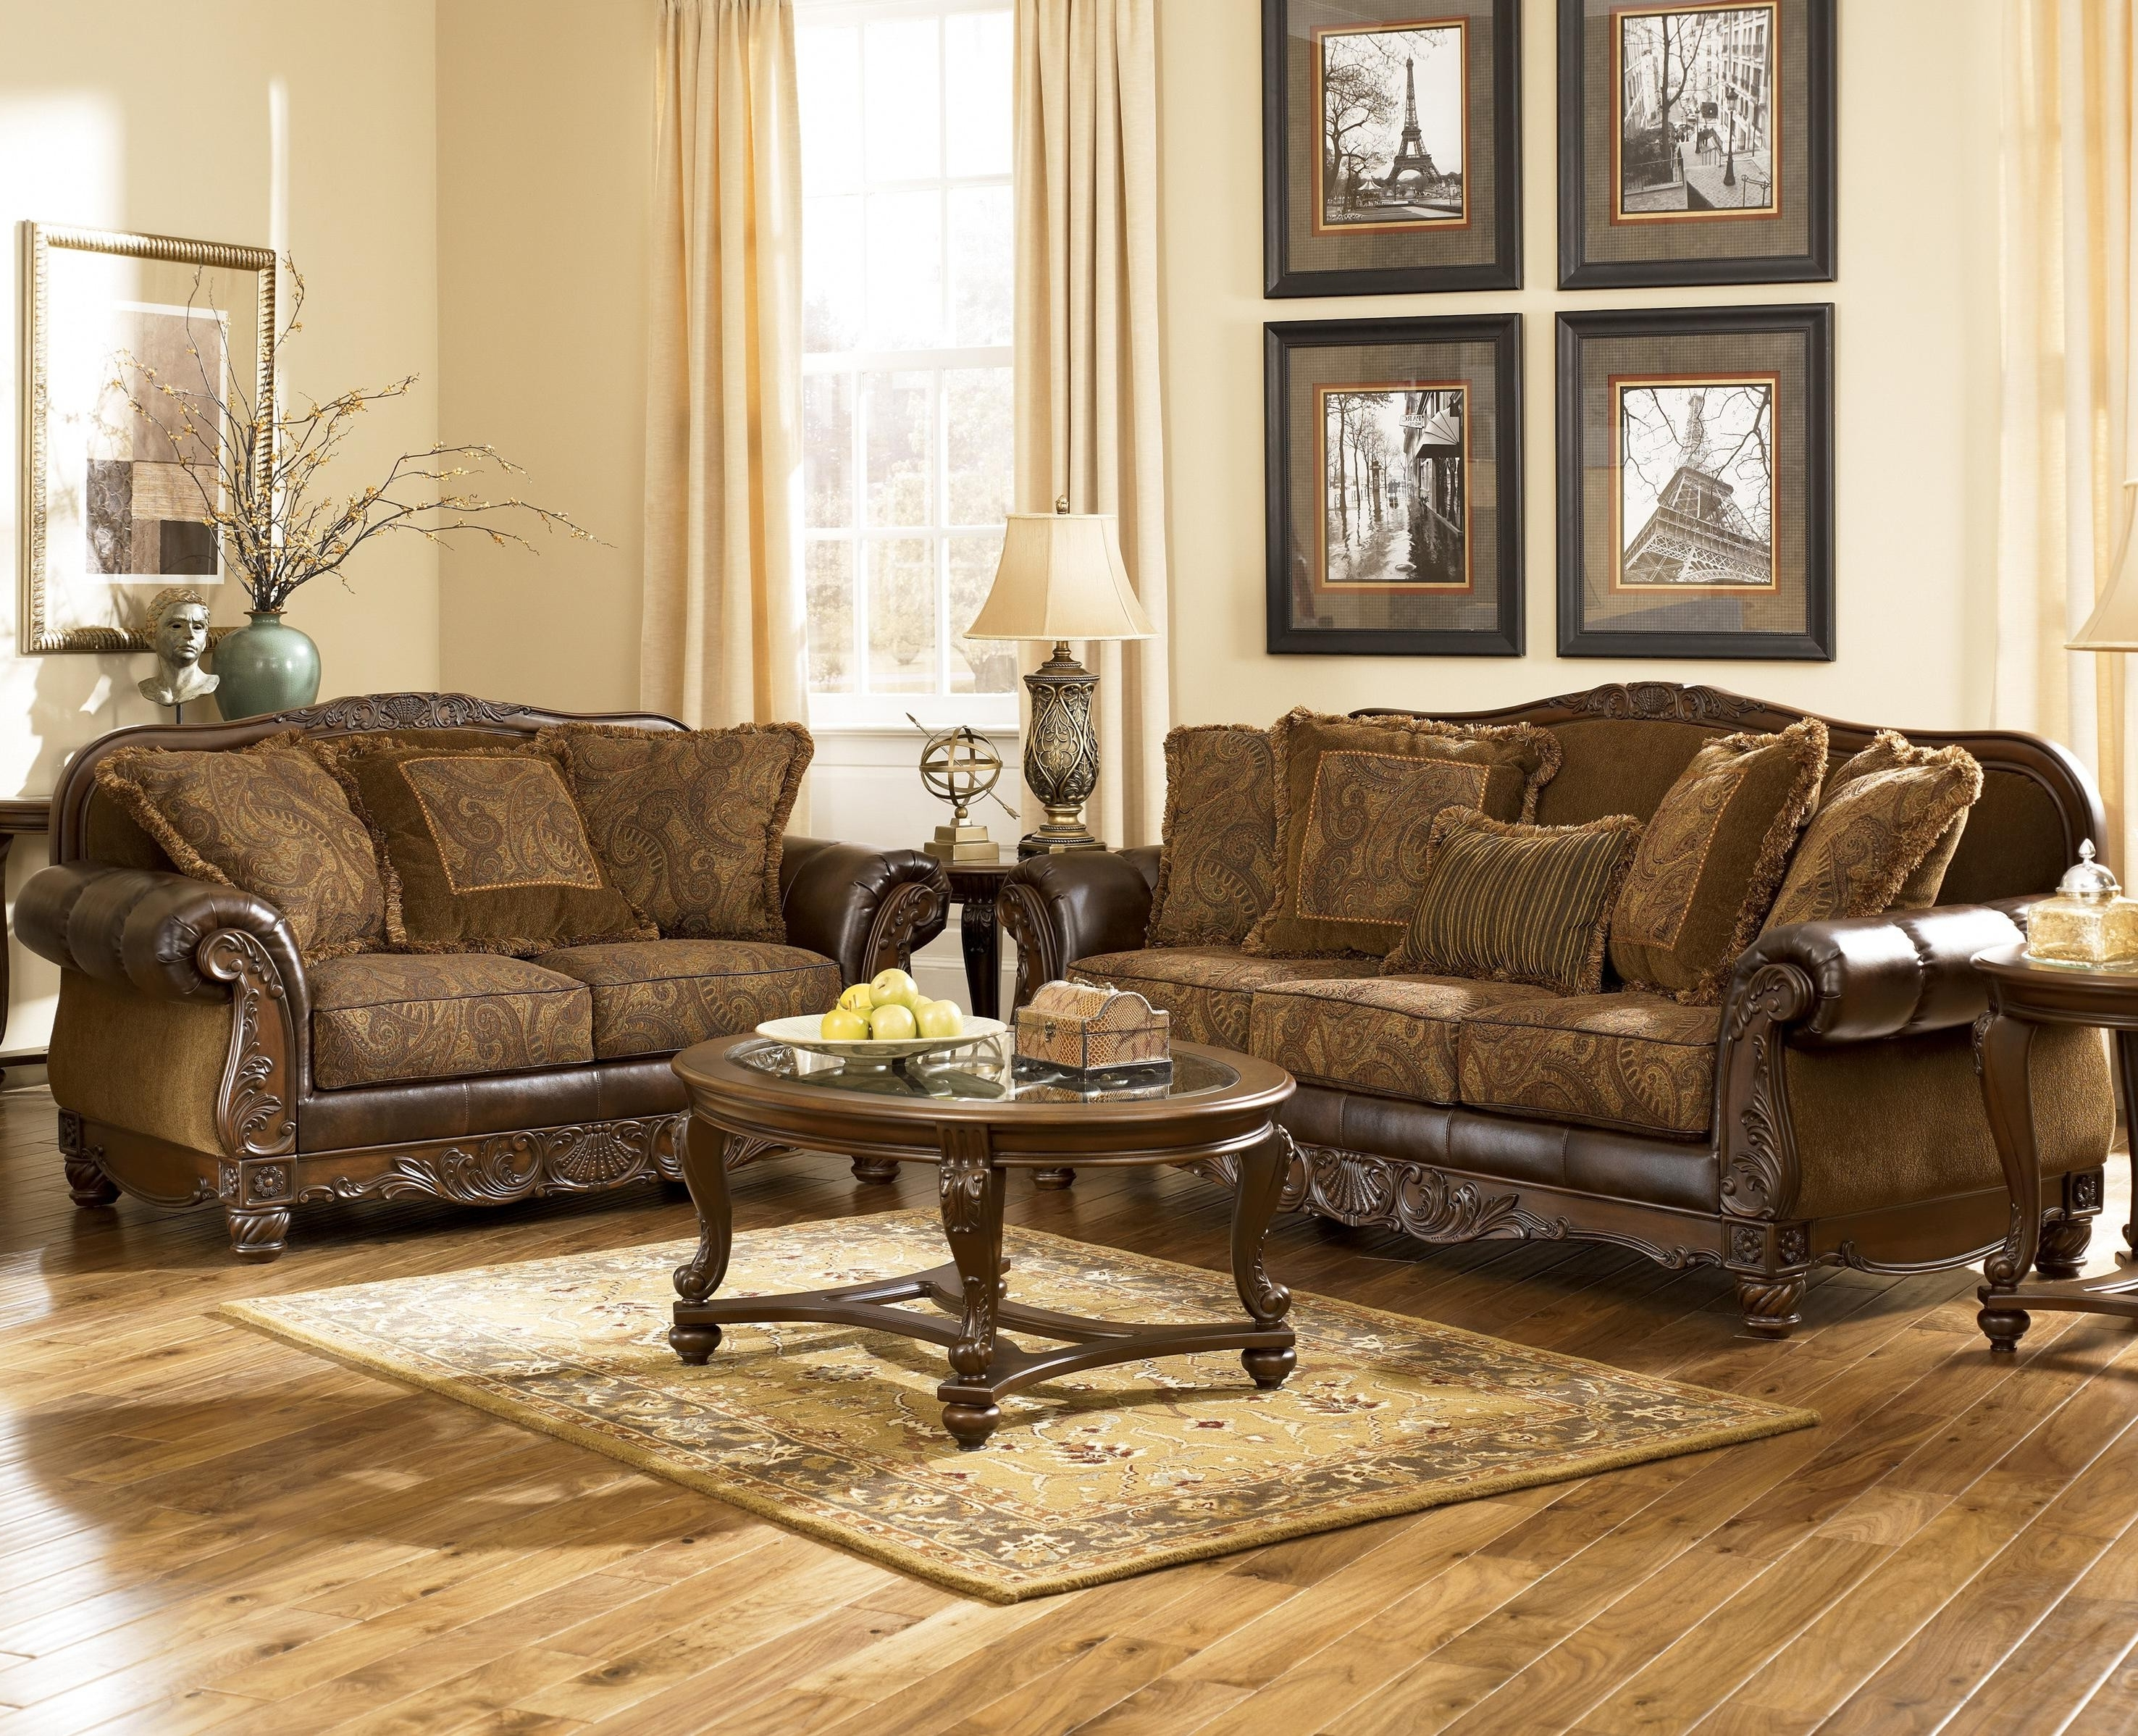 Favorite Murfreesboro Tn Sectional Sofas Within Ashley Furniture Nashville Tn New Furniture Fmo Murfreesboro Tn (View 1 of 15)